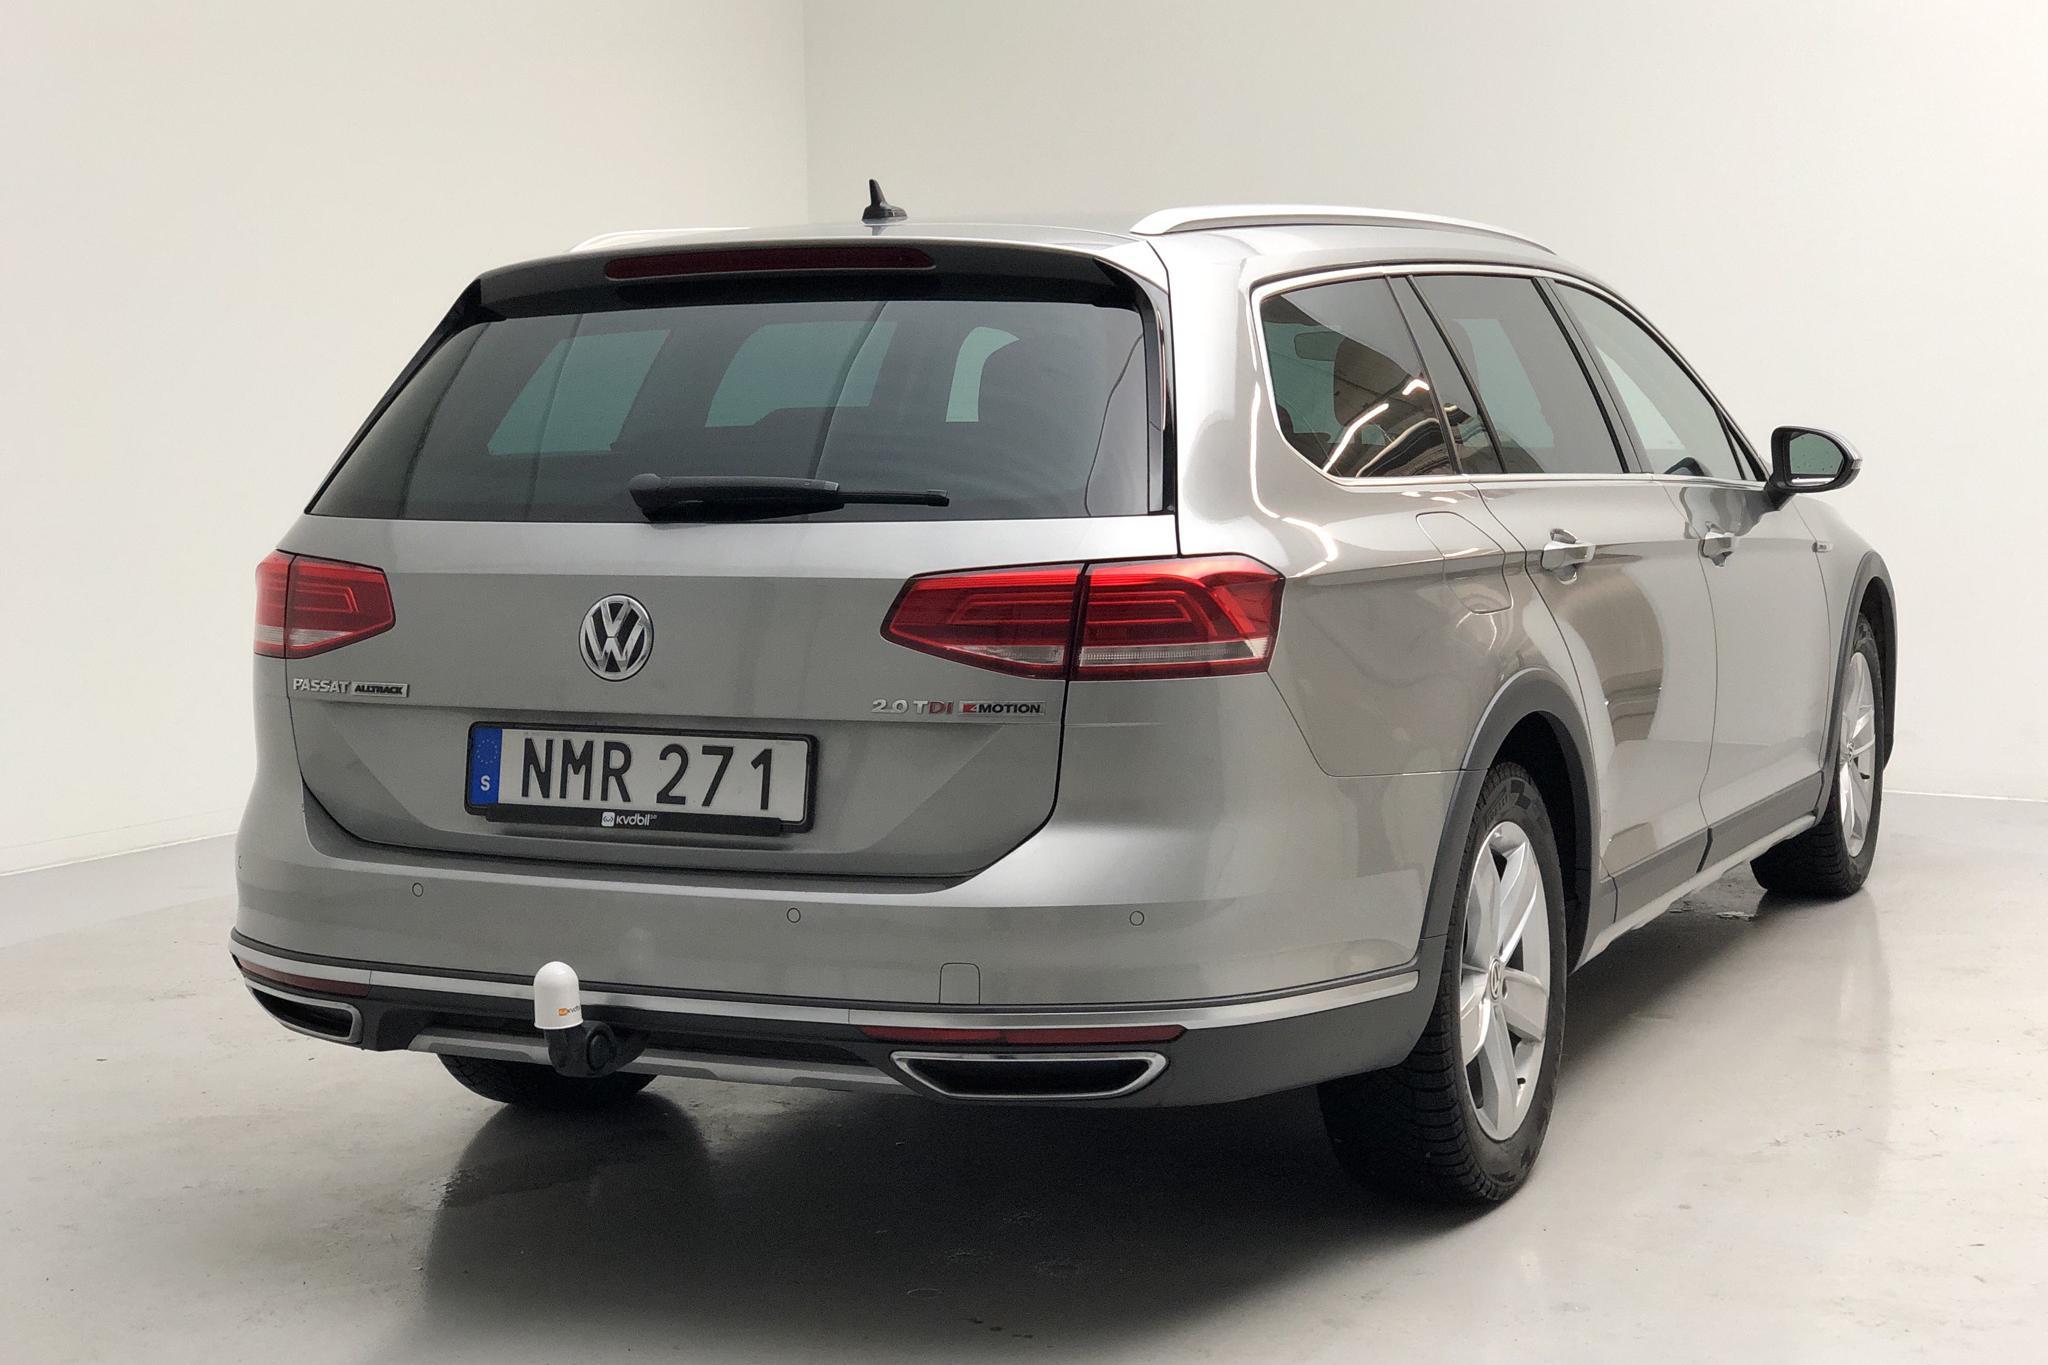 VW Passat Alltrack 2.0 TDI Sportscombi 4MOTION (190hk) - 17 526 mil - Automat - silver - 2017